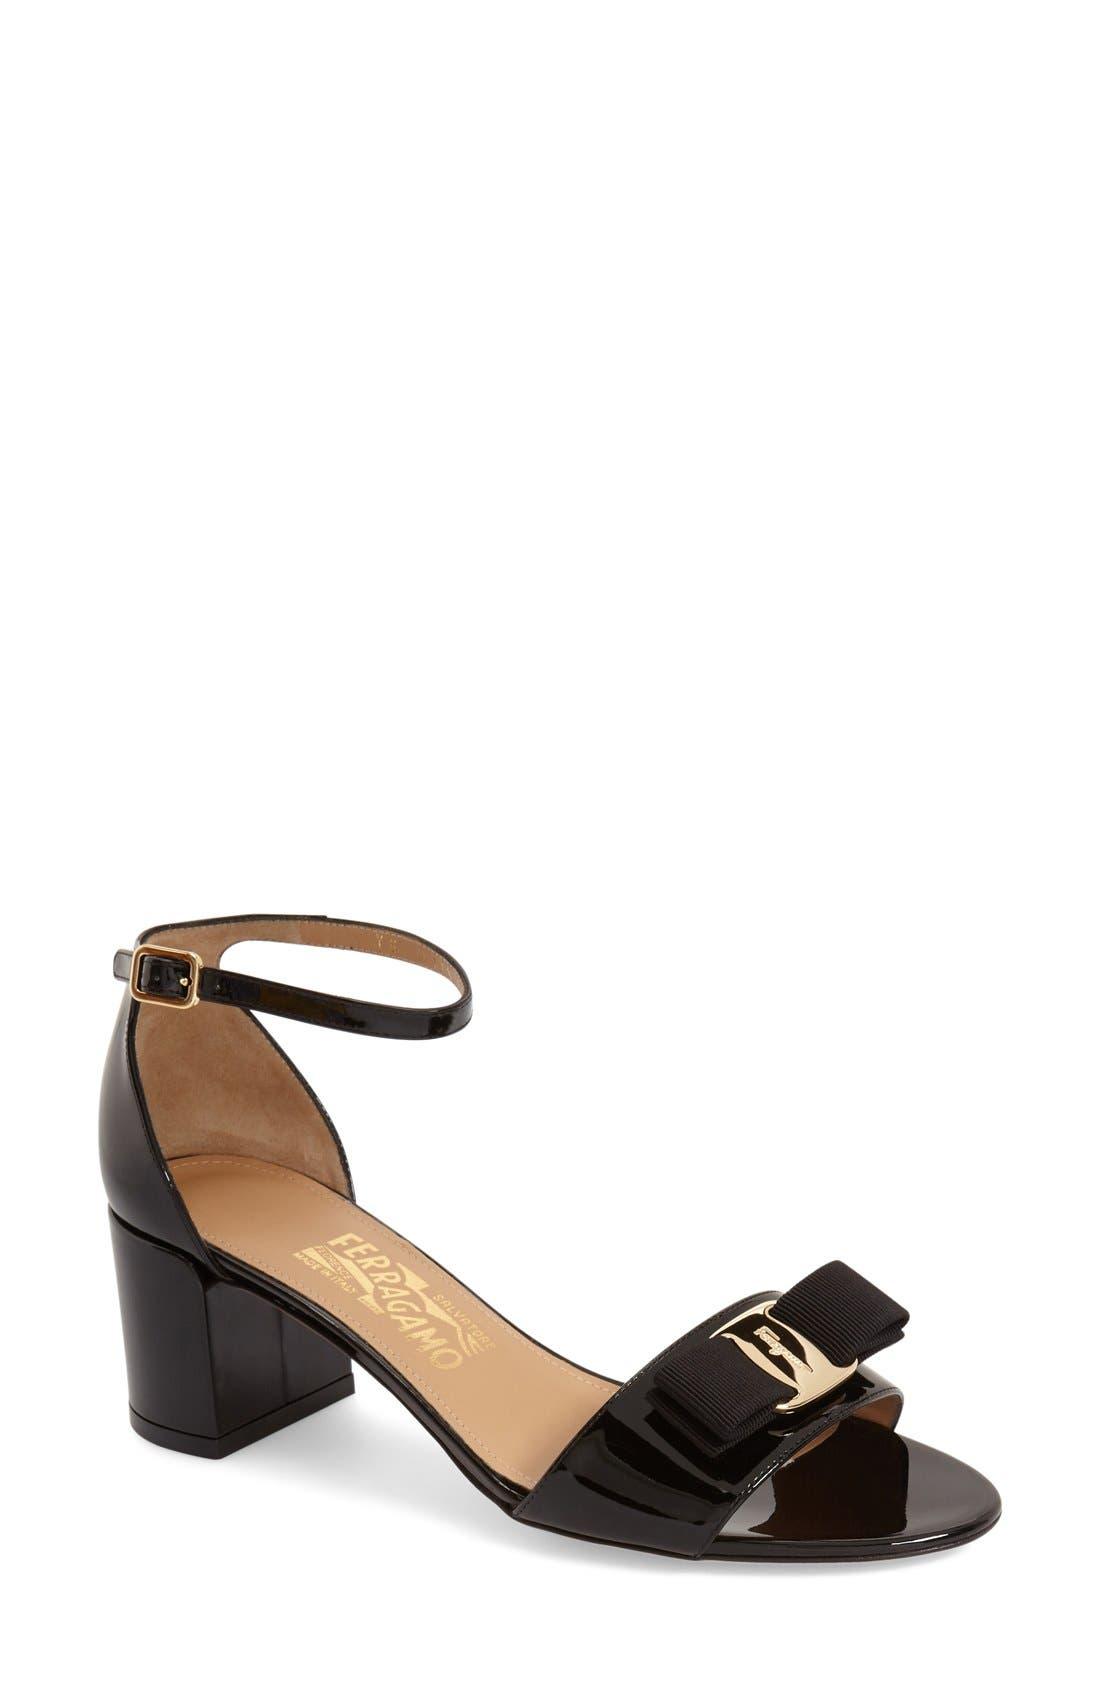 Gavina Block Heel Bow Sandal,                             Main thumbnail 1, color,                             Black Patent